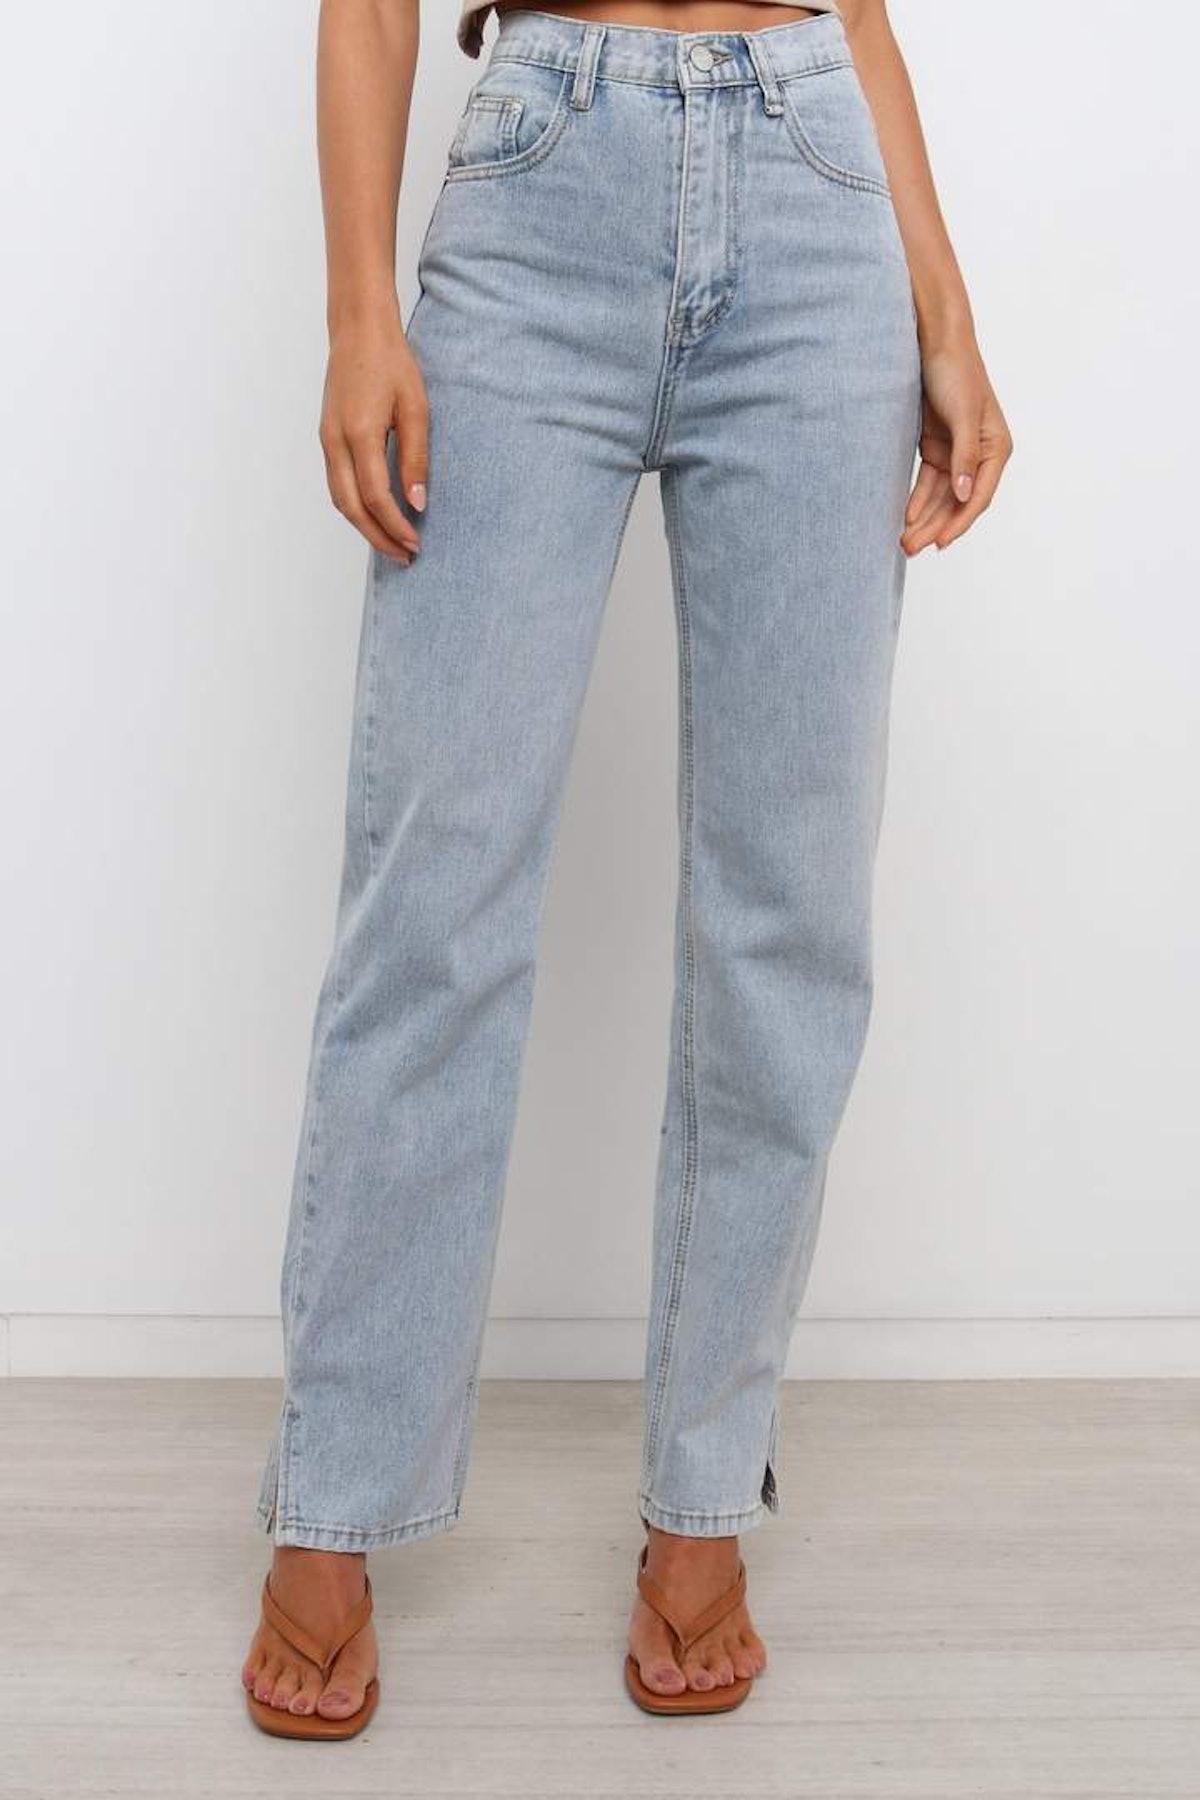 Westland Jeans in Light Wash